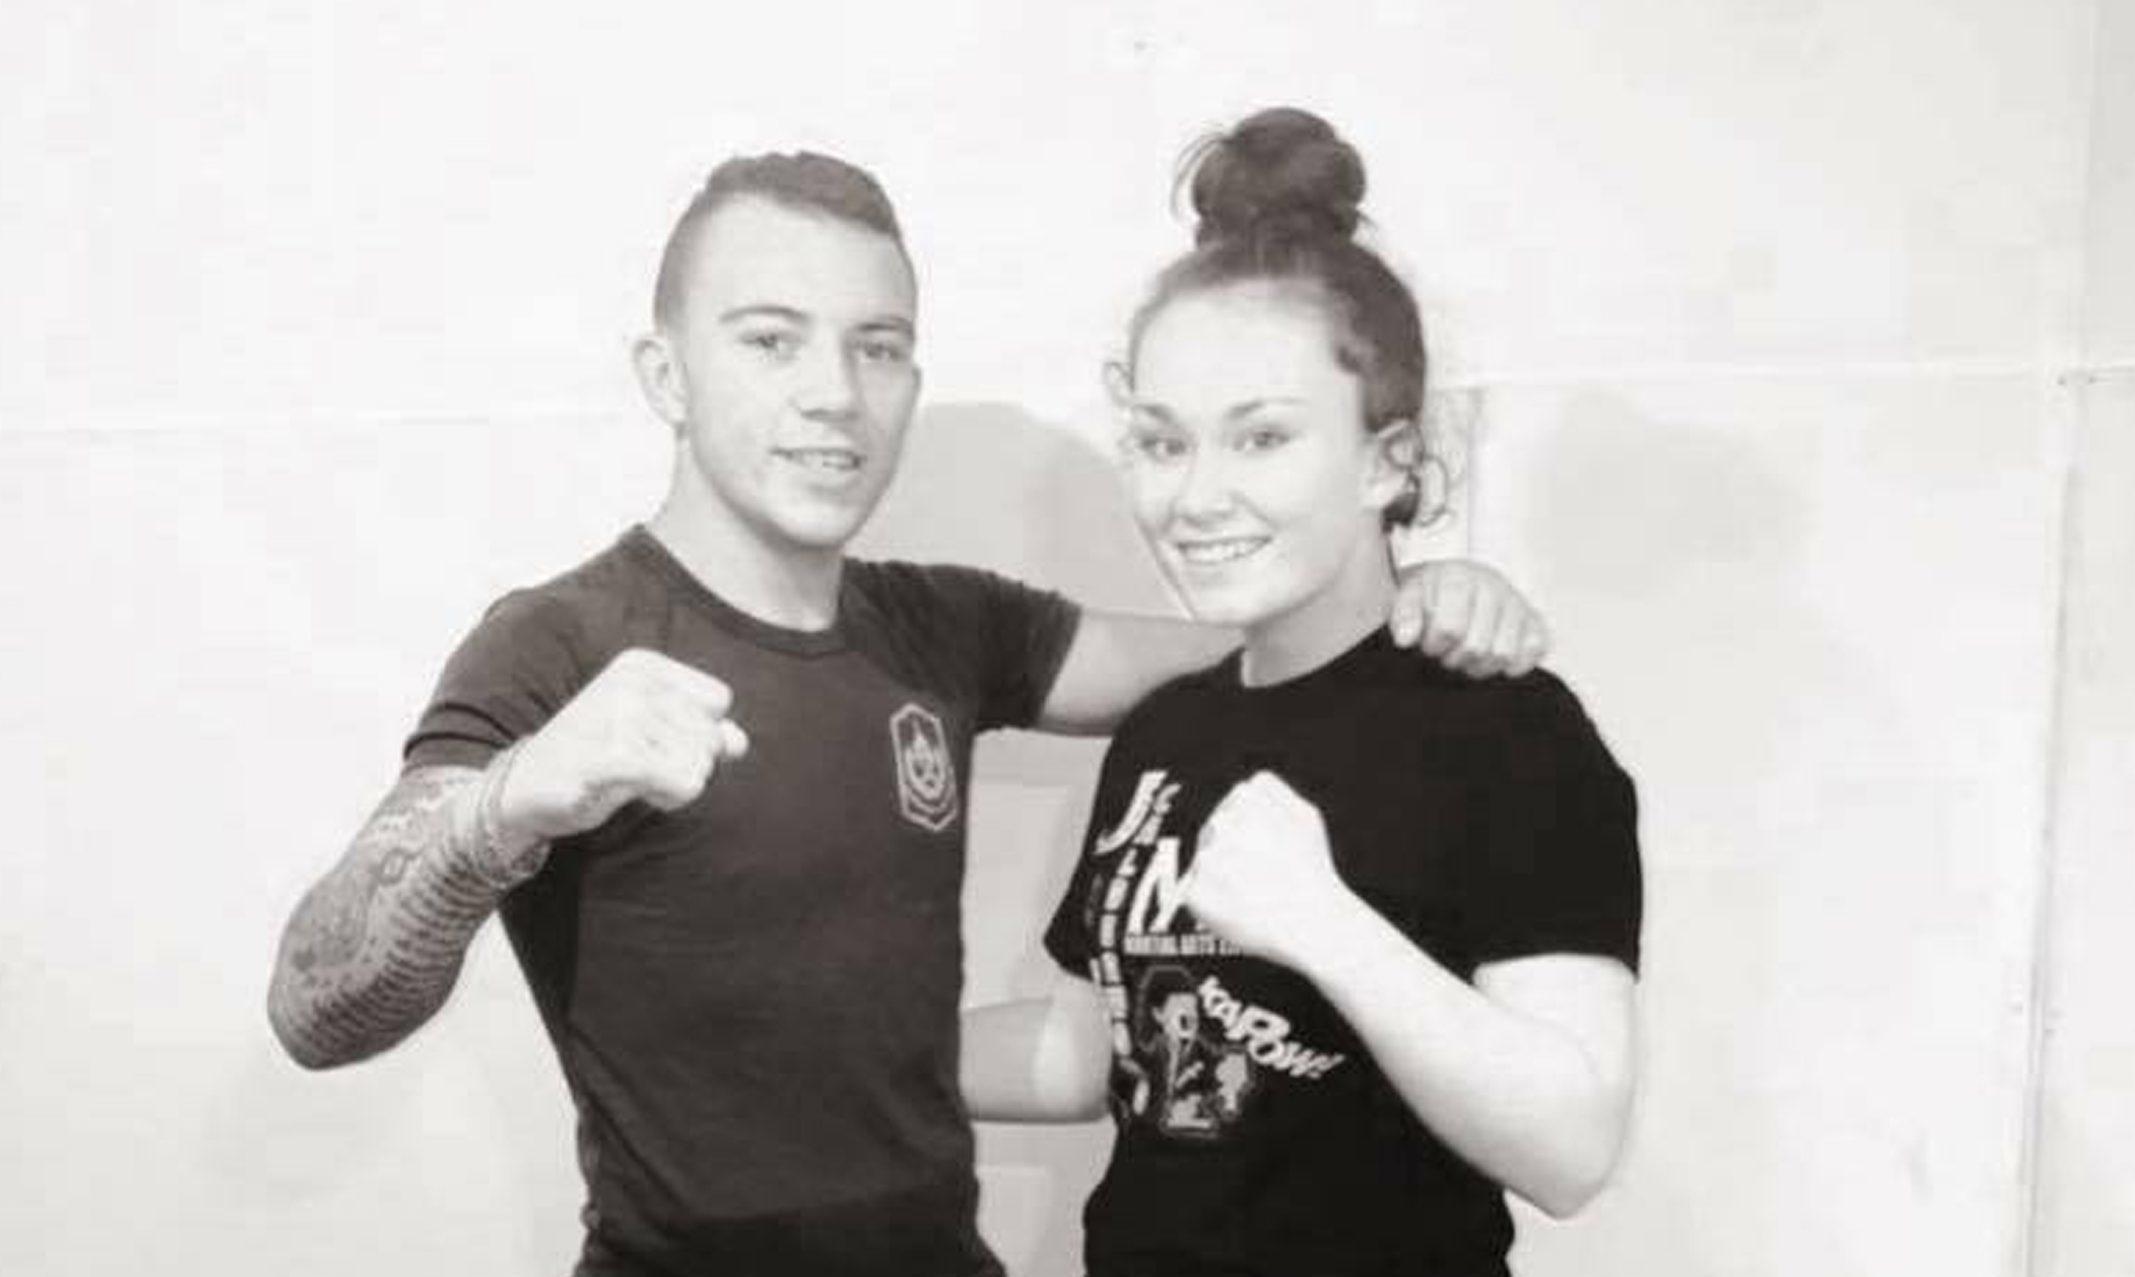 Jordan Coe and Ellie Burr, daughter of Wendy Smith of Granite Fight Factory.